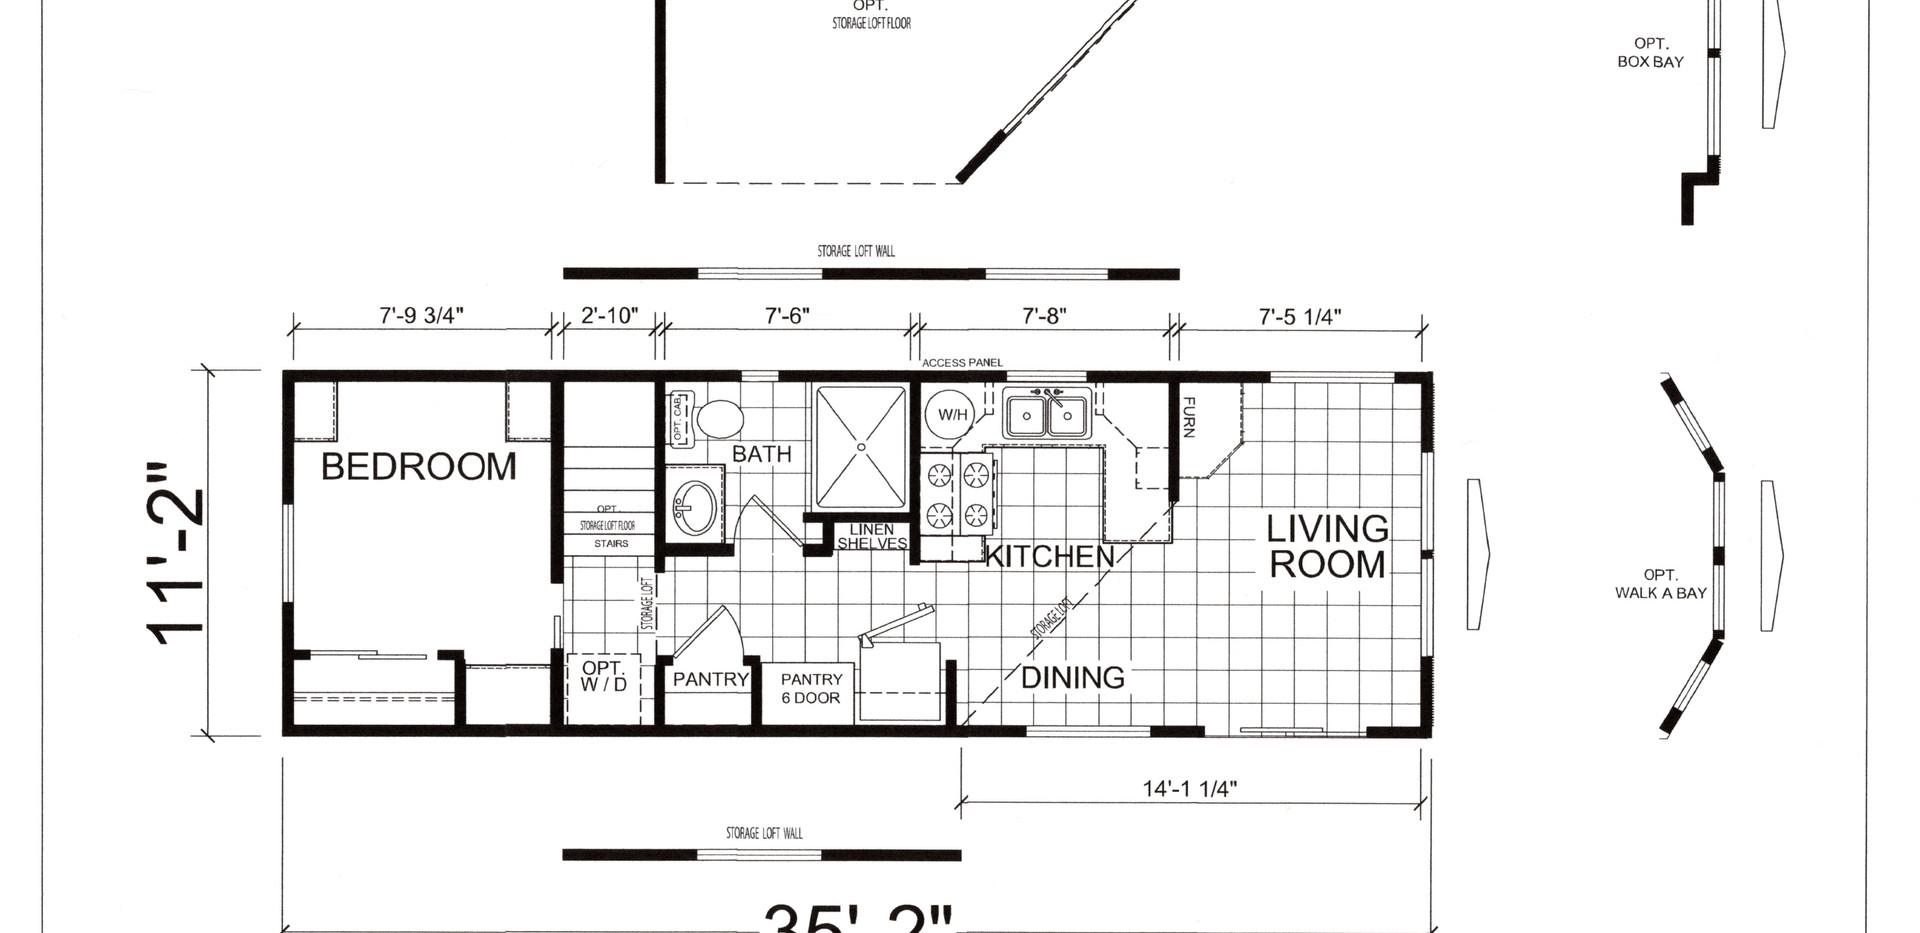 11-2 x 35-2 large loft.jpg